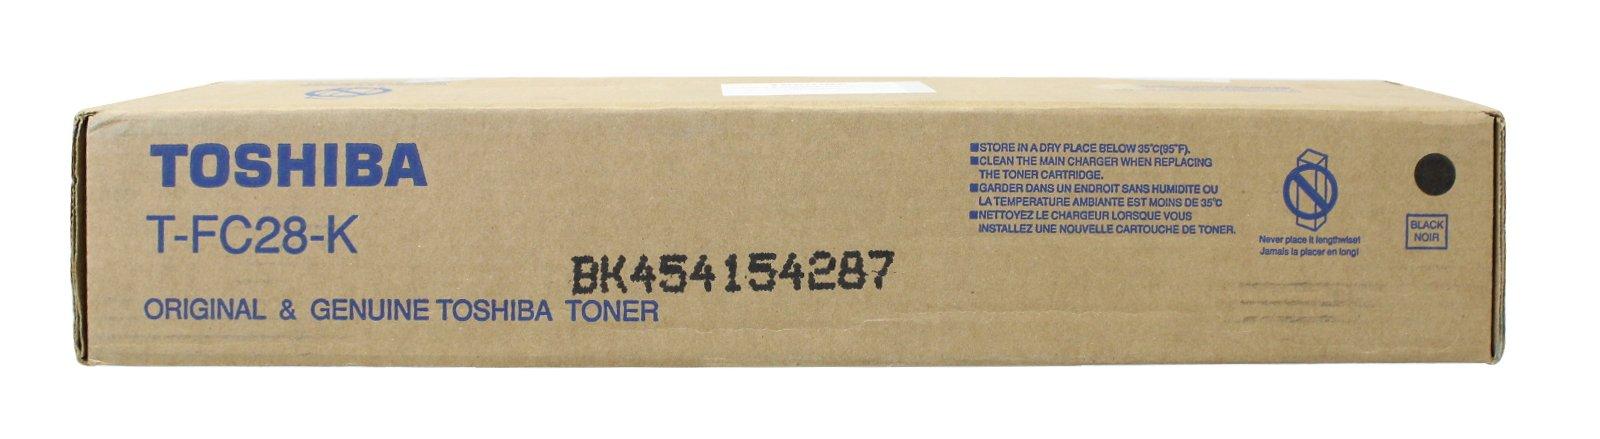 For ESTUDIO4520C Toshiba OEM Copier Supplies TFC28K TONER CARTRIDGE TFC28K BLACK